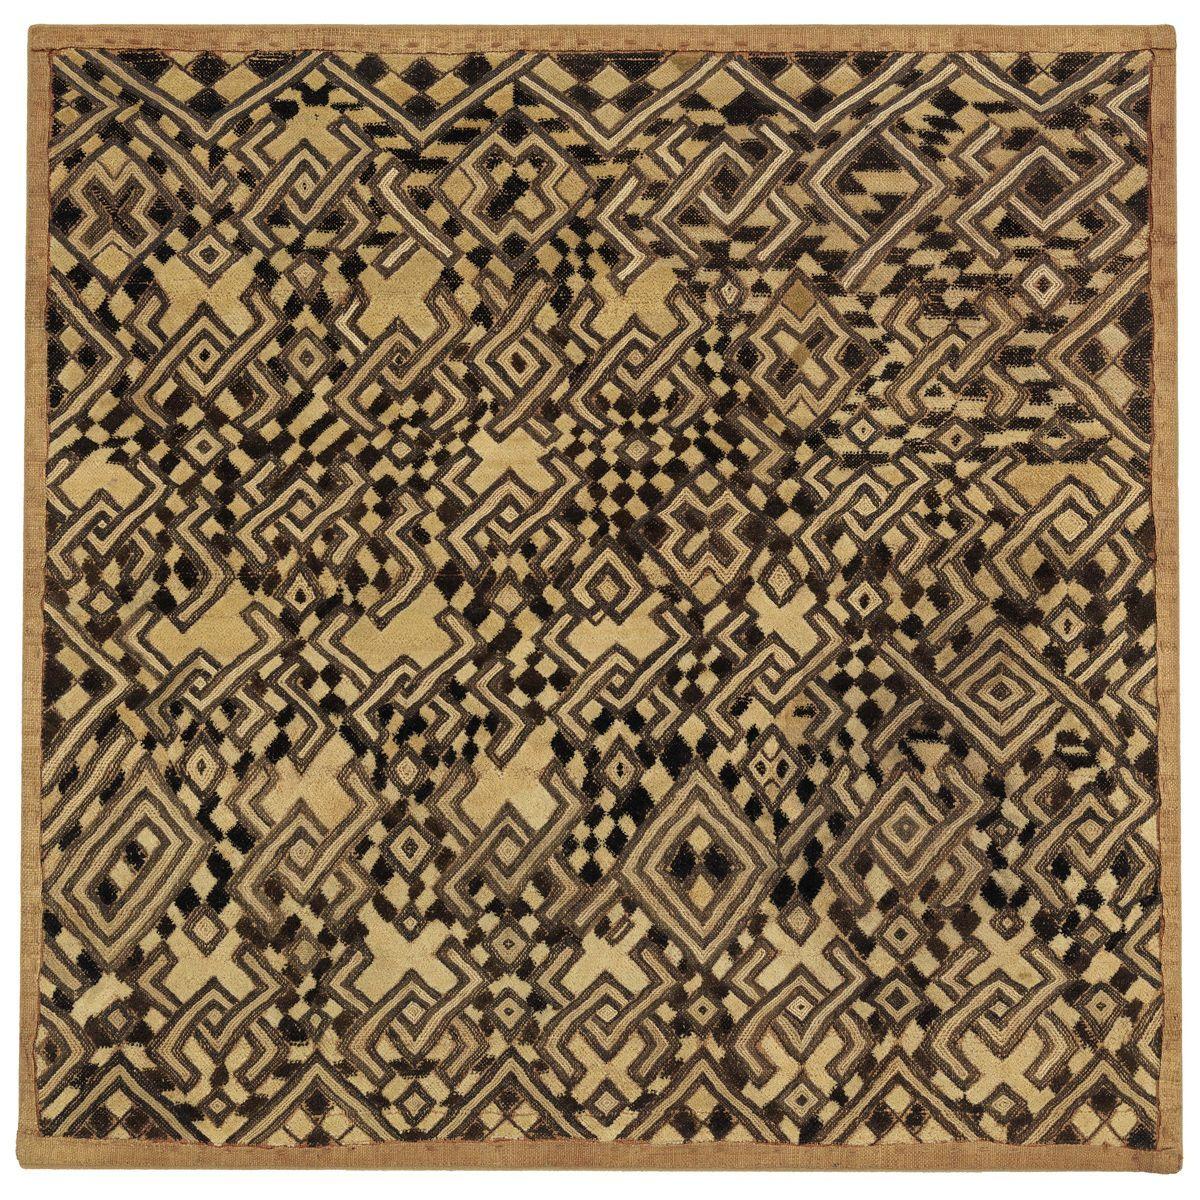 tissu africain congo